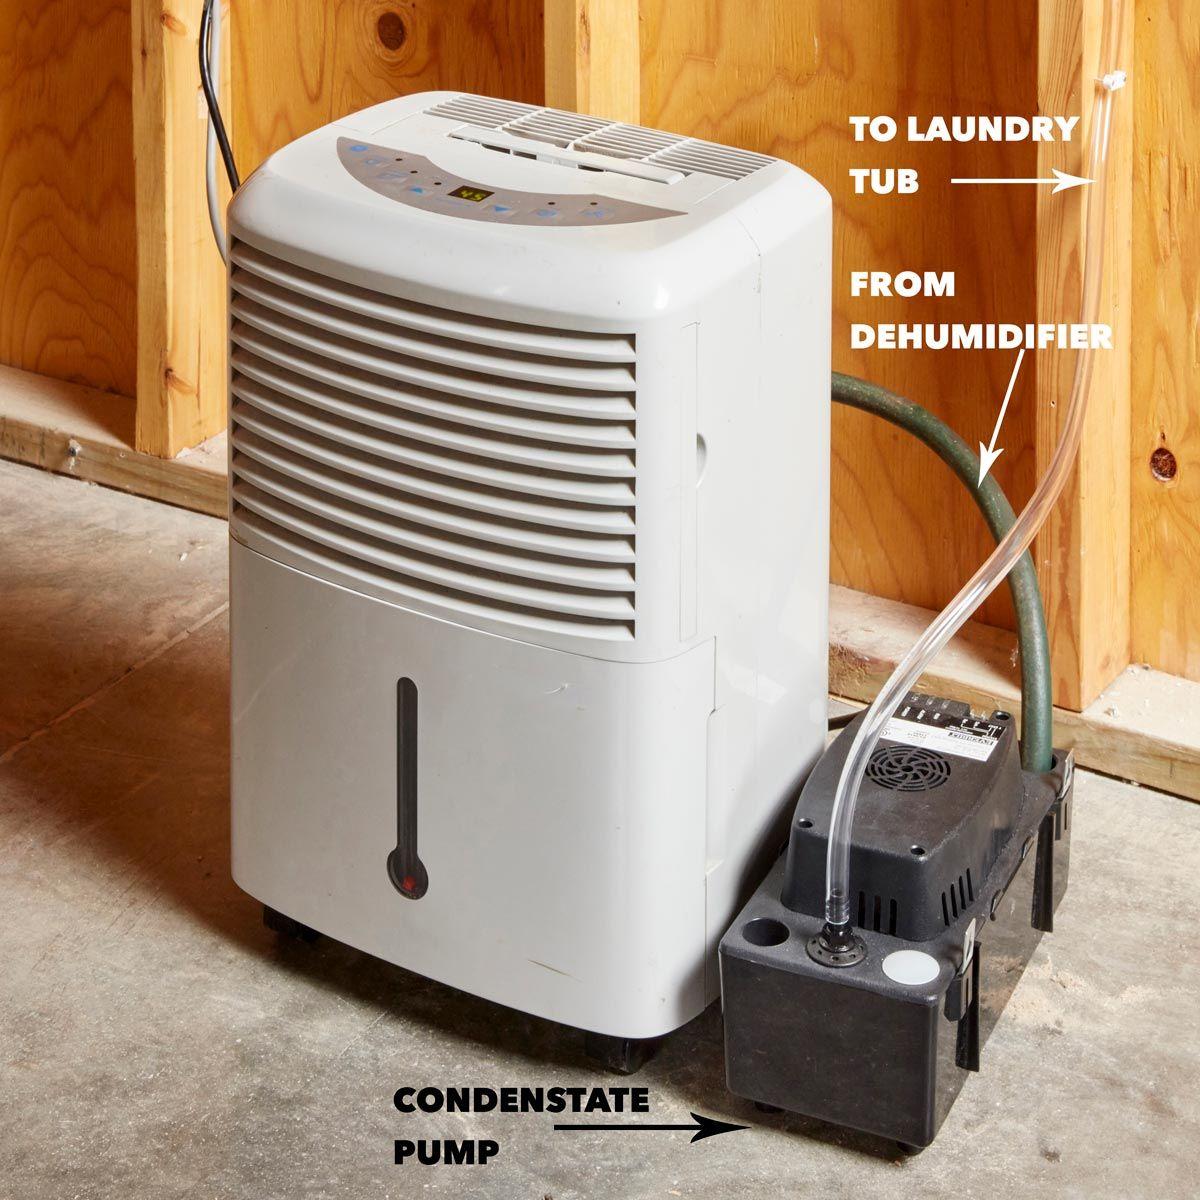 Save Time With A Diy Self Draining Dehumidifier Dehumidifier